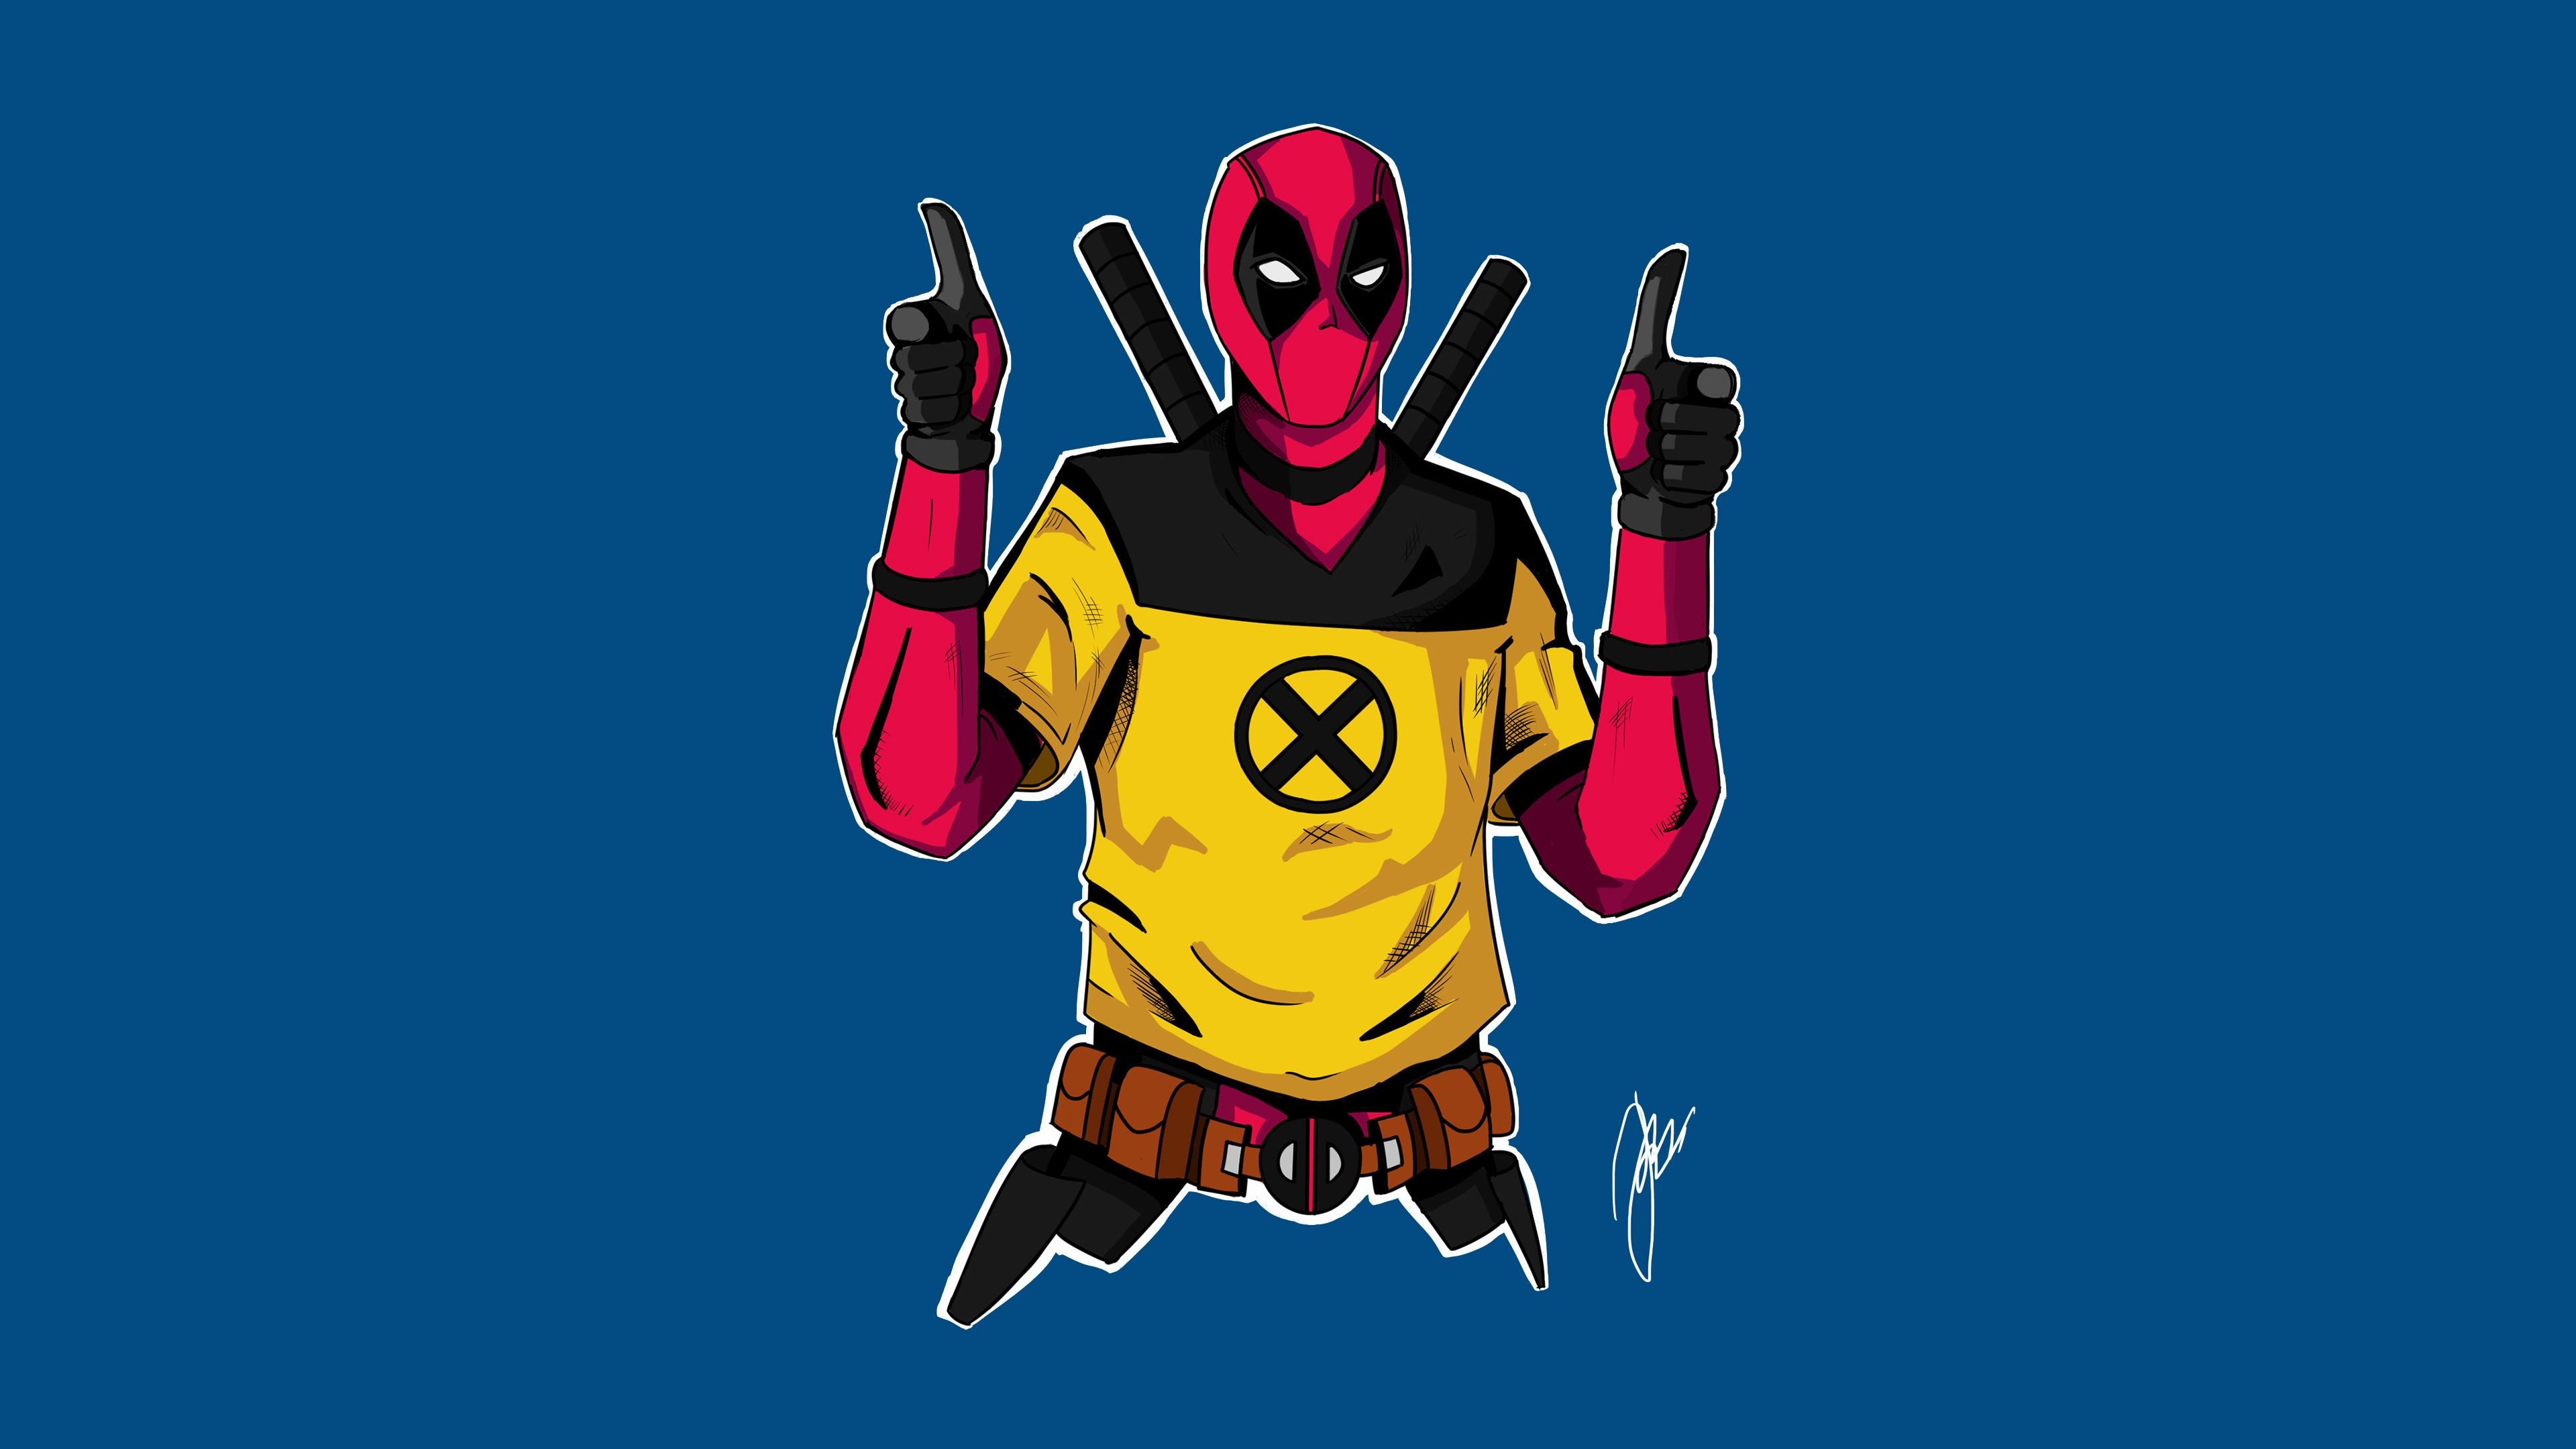 2048x2048 Deadpool 2 Movie Poster 4k Ipad Air Hd 4k: Deadpool 2 Character Artwork Superheroes Wallpapers, Hd